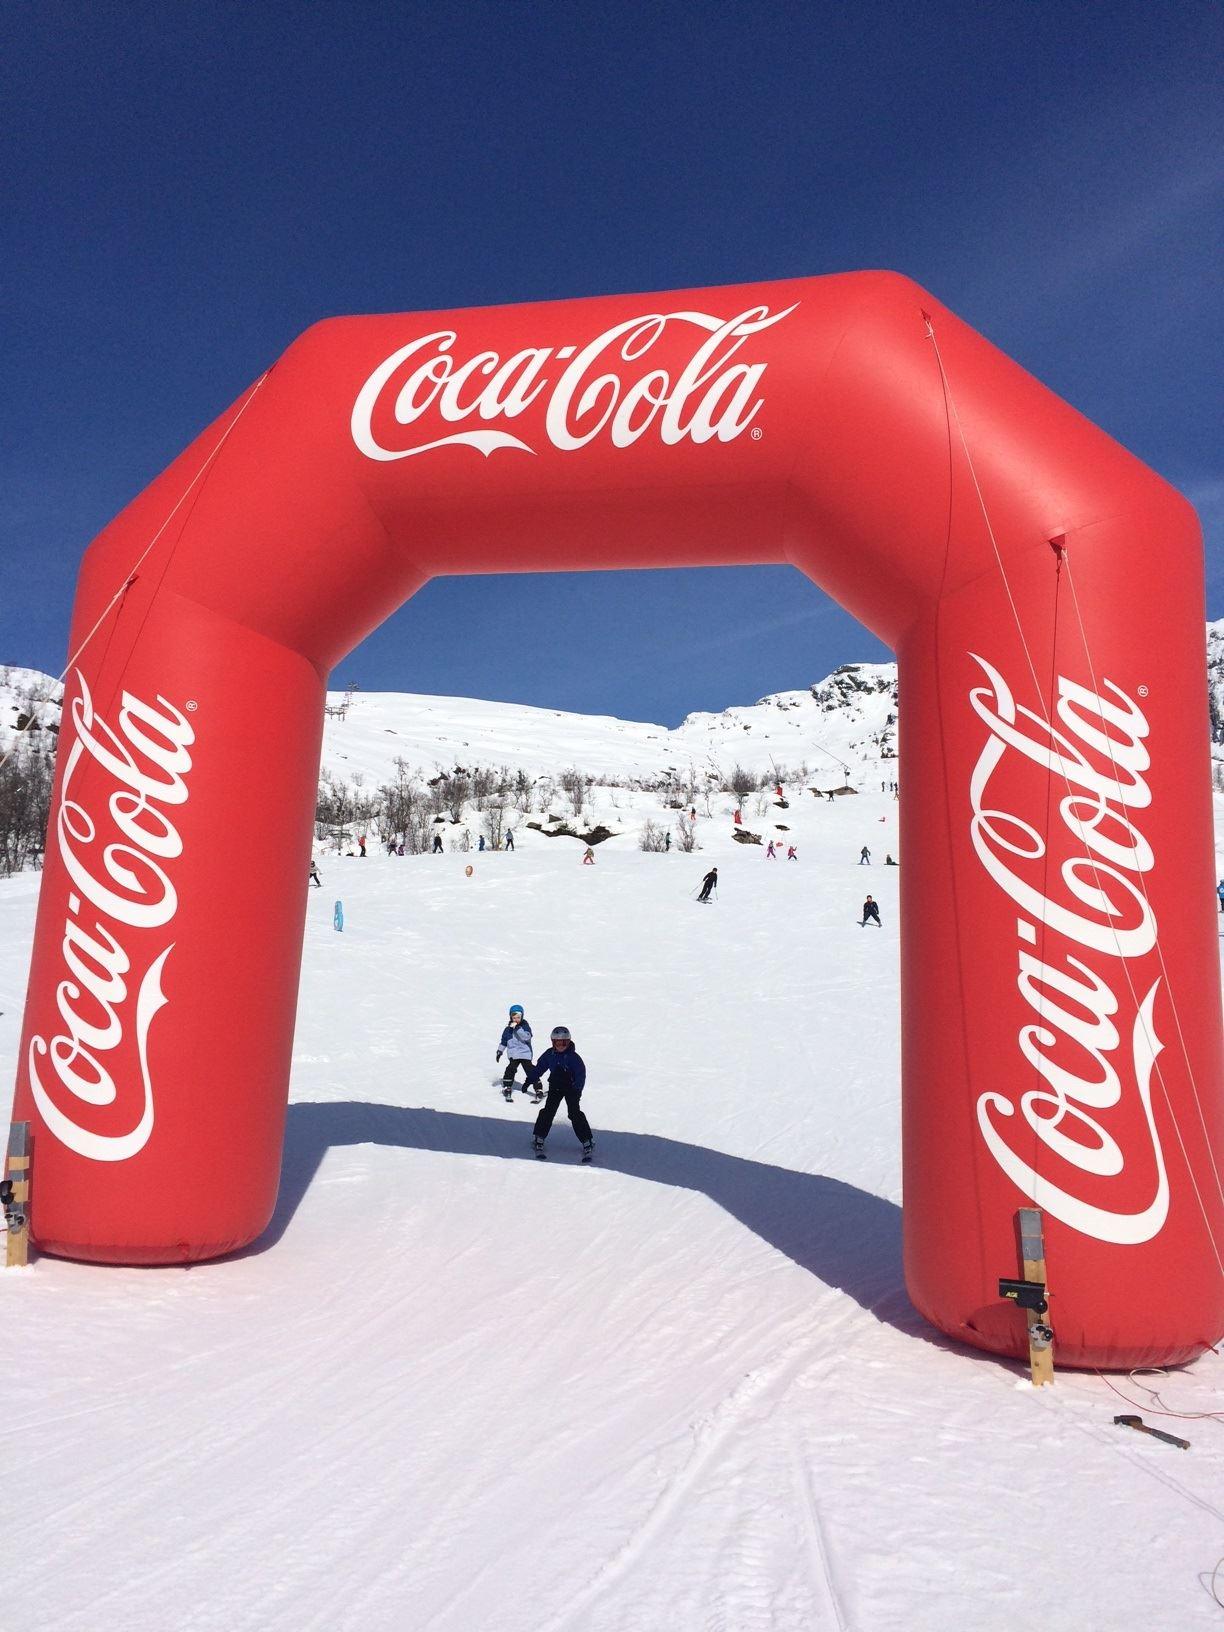 Coca Cola Familieskirenn